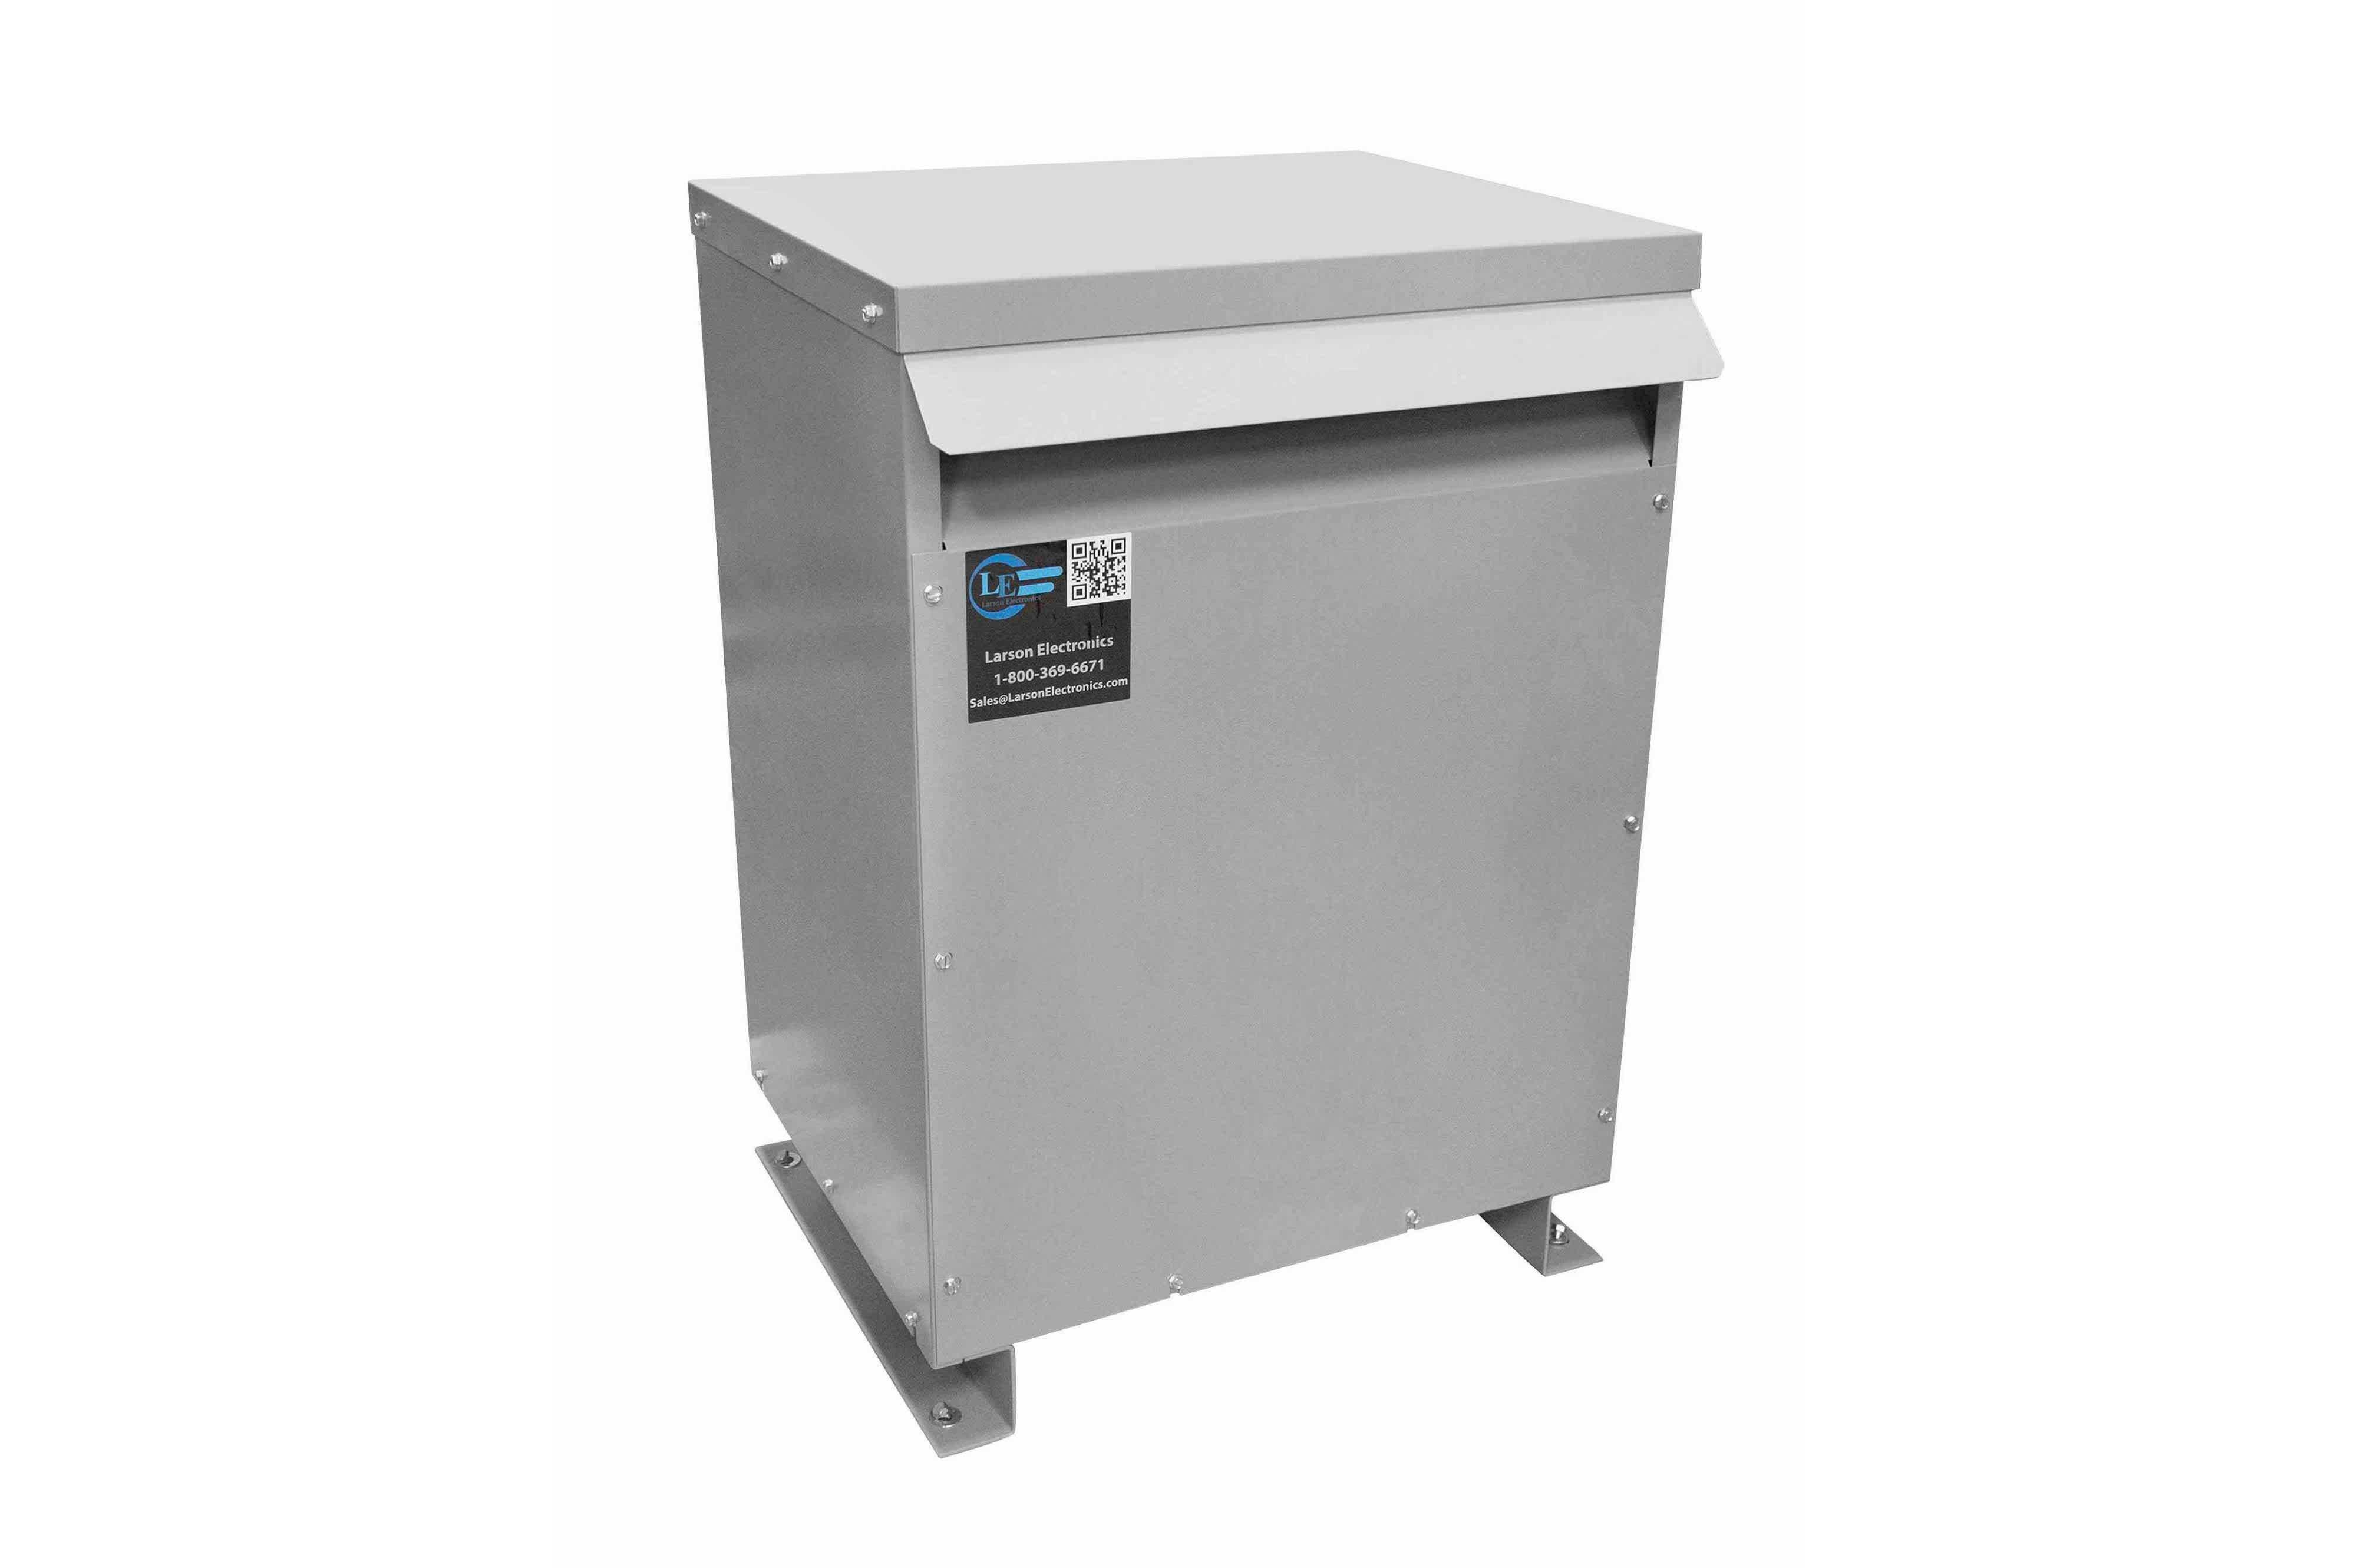 28 kVA 3PH Isolation Transformer, 600V Wye Primary, 208Y/120 Wye-N Secondary, N3R, Ventilated, 60 Hz